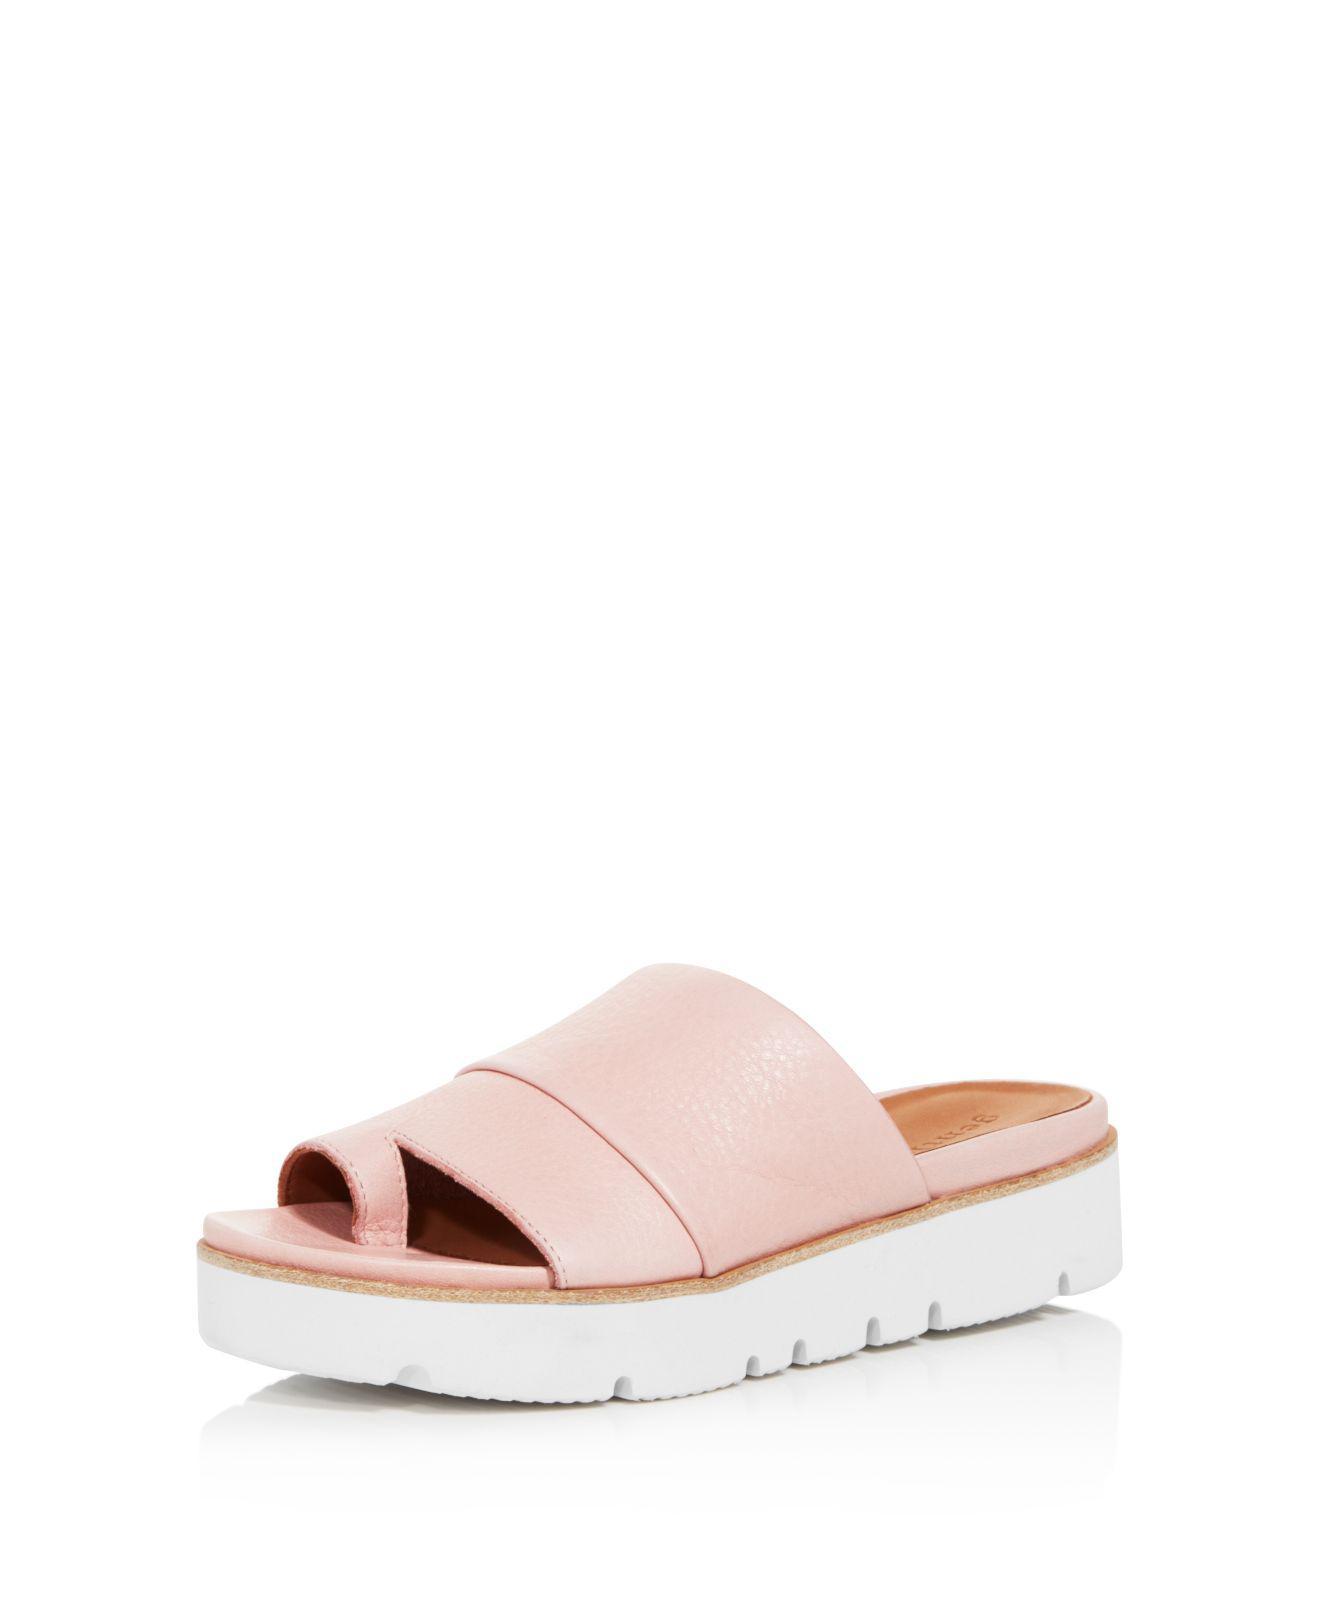 67f34c817f Lyst - Gentle Souls Women's Lavern Leather Platform Slide Sandals